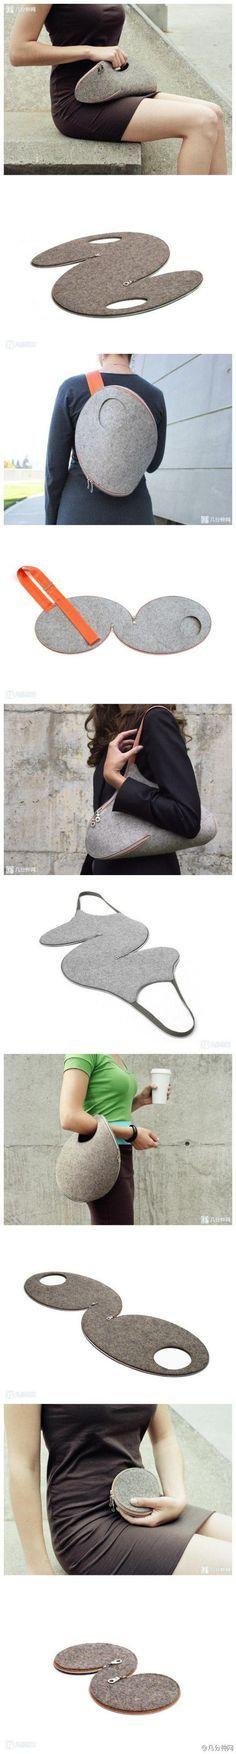 DIY Cool Lady Bag DIY Projecten | UsefulDIY.com Follow us on Facebook ==> https://www.facebook.com/UsefulDiy